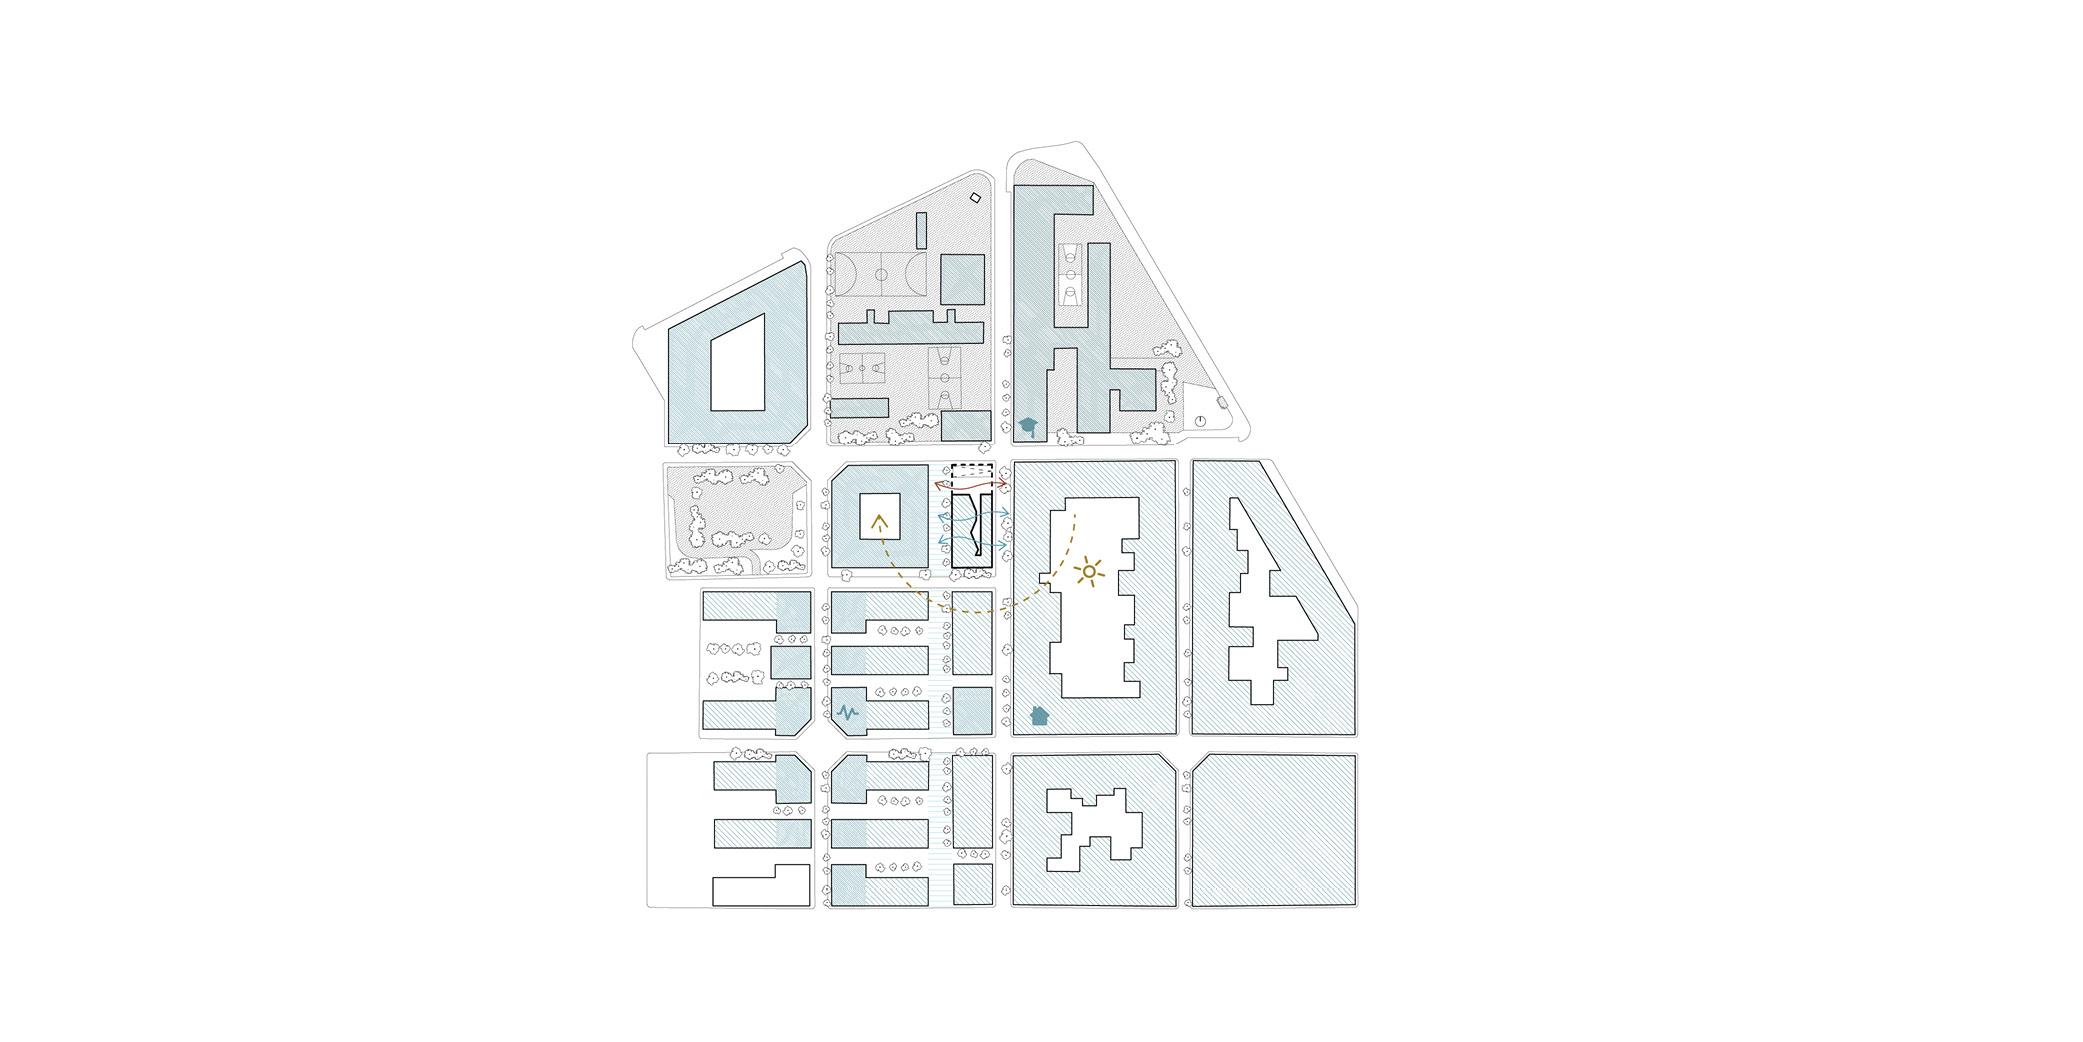 Terrasa housing OCA ARCHITEctS OCA ARQUITECTOS architecture design Hernan Lleida Bernardo Garcia 1